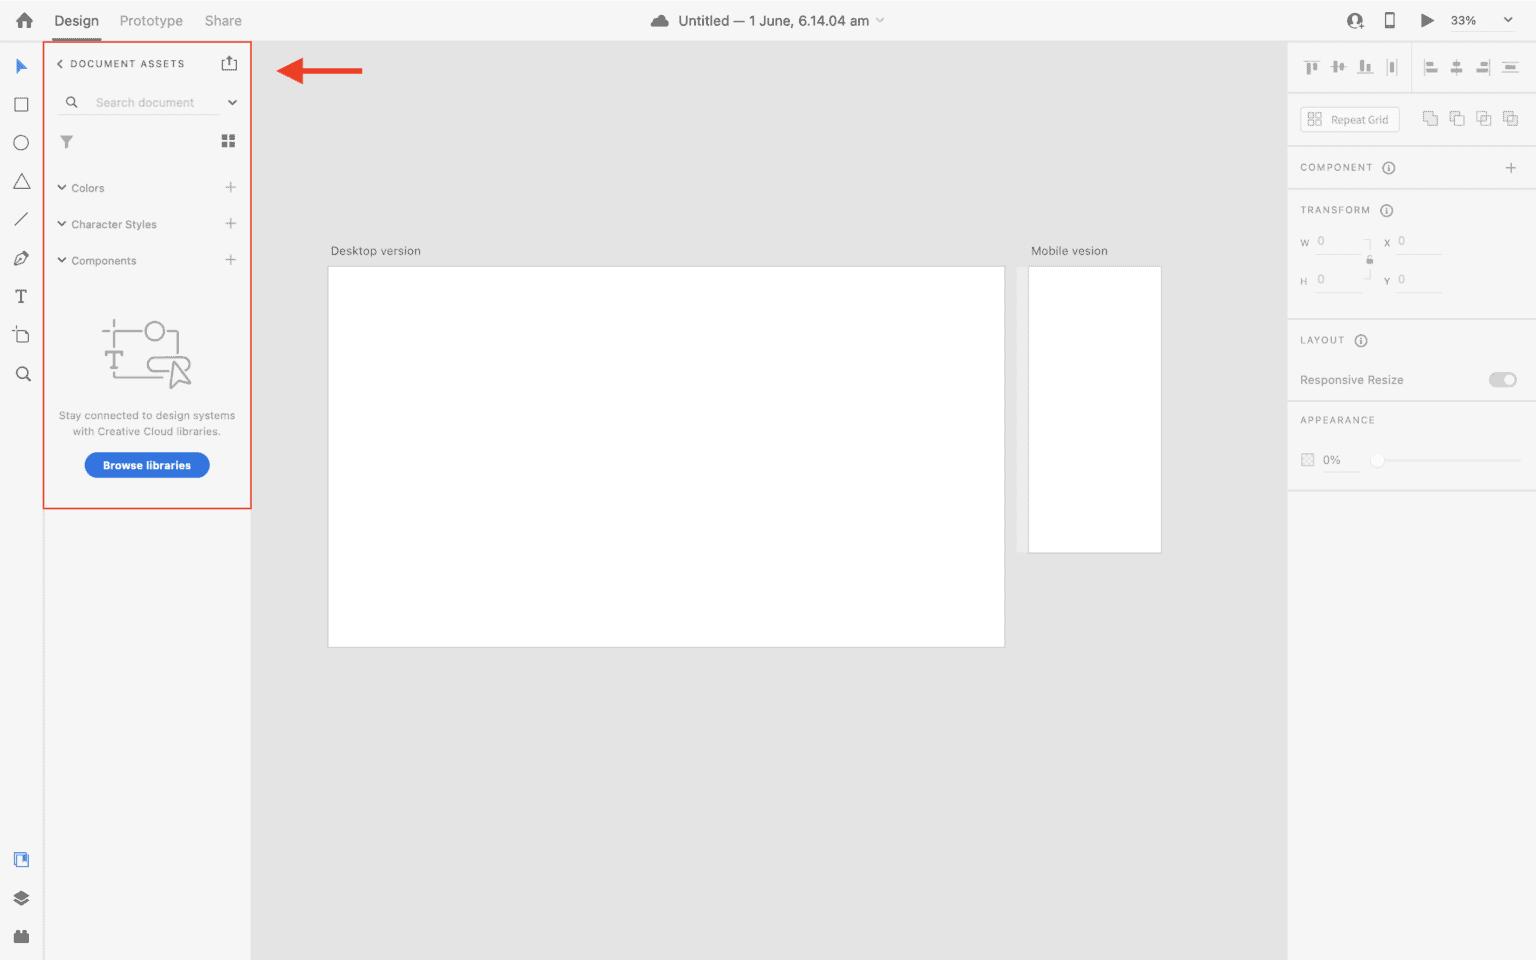 Document assets panel